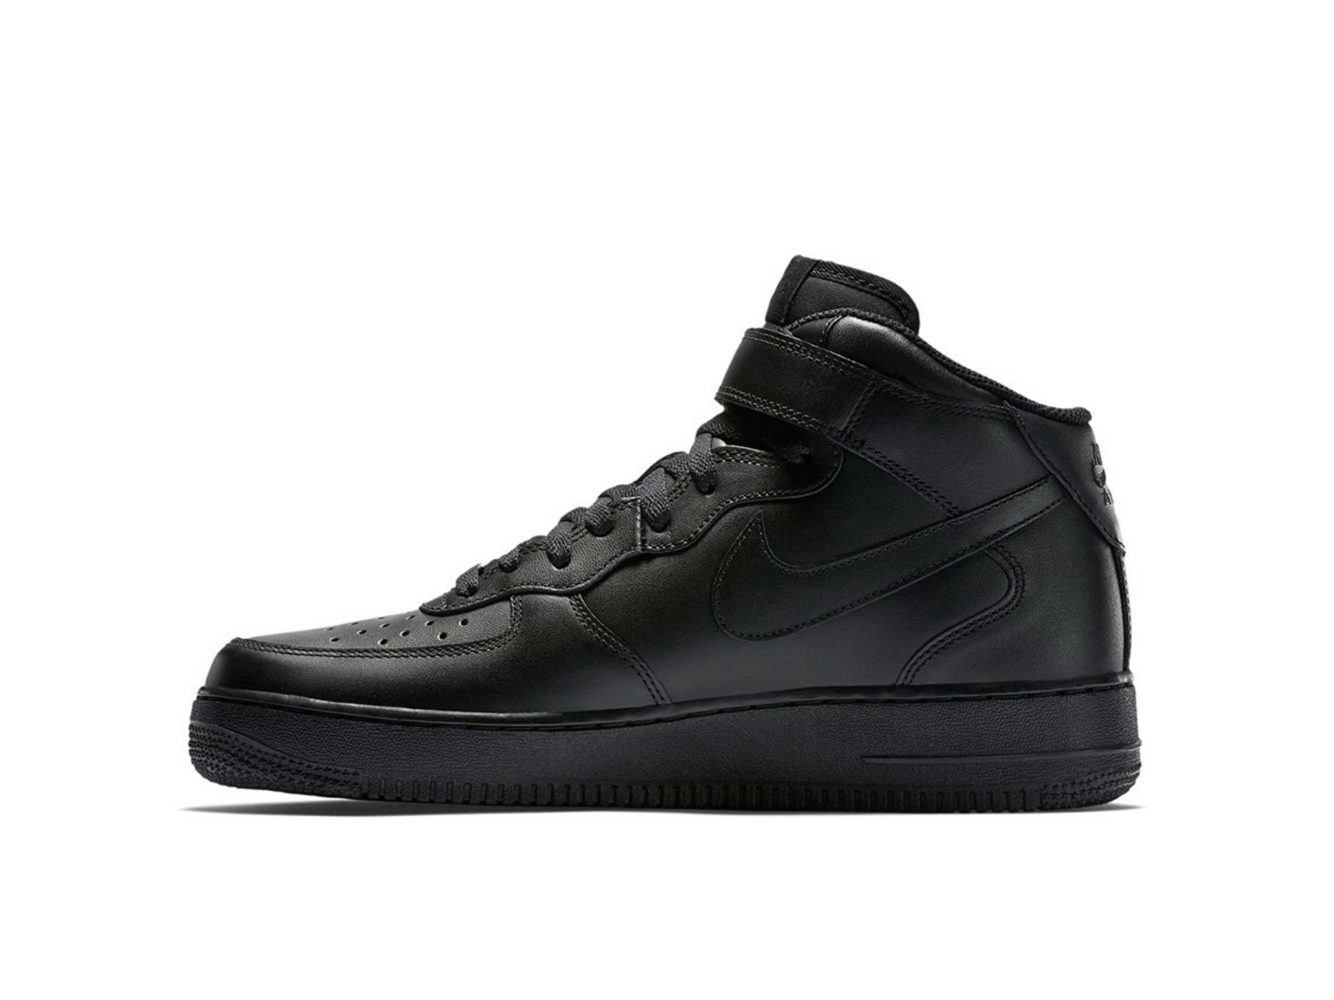 nike air force 1 mid black 315123_001 купить